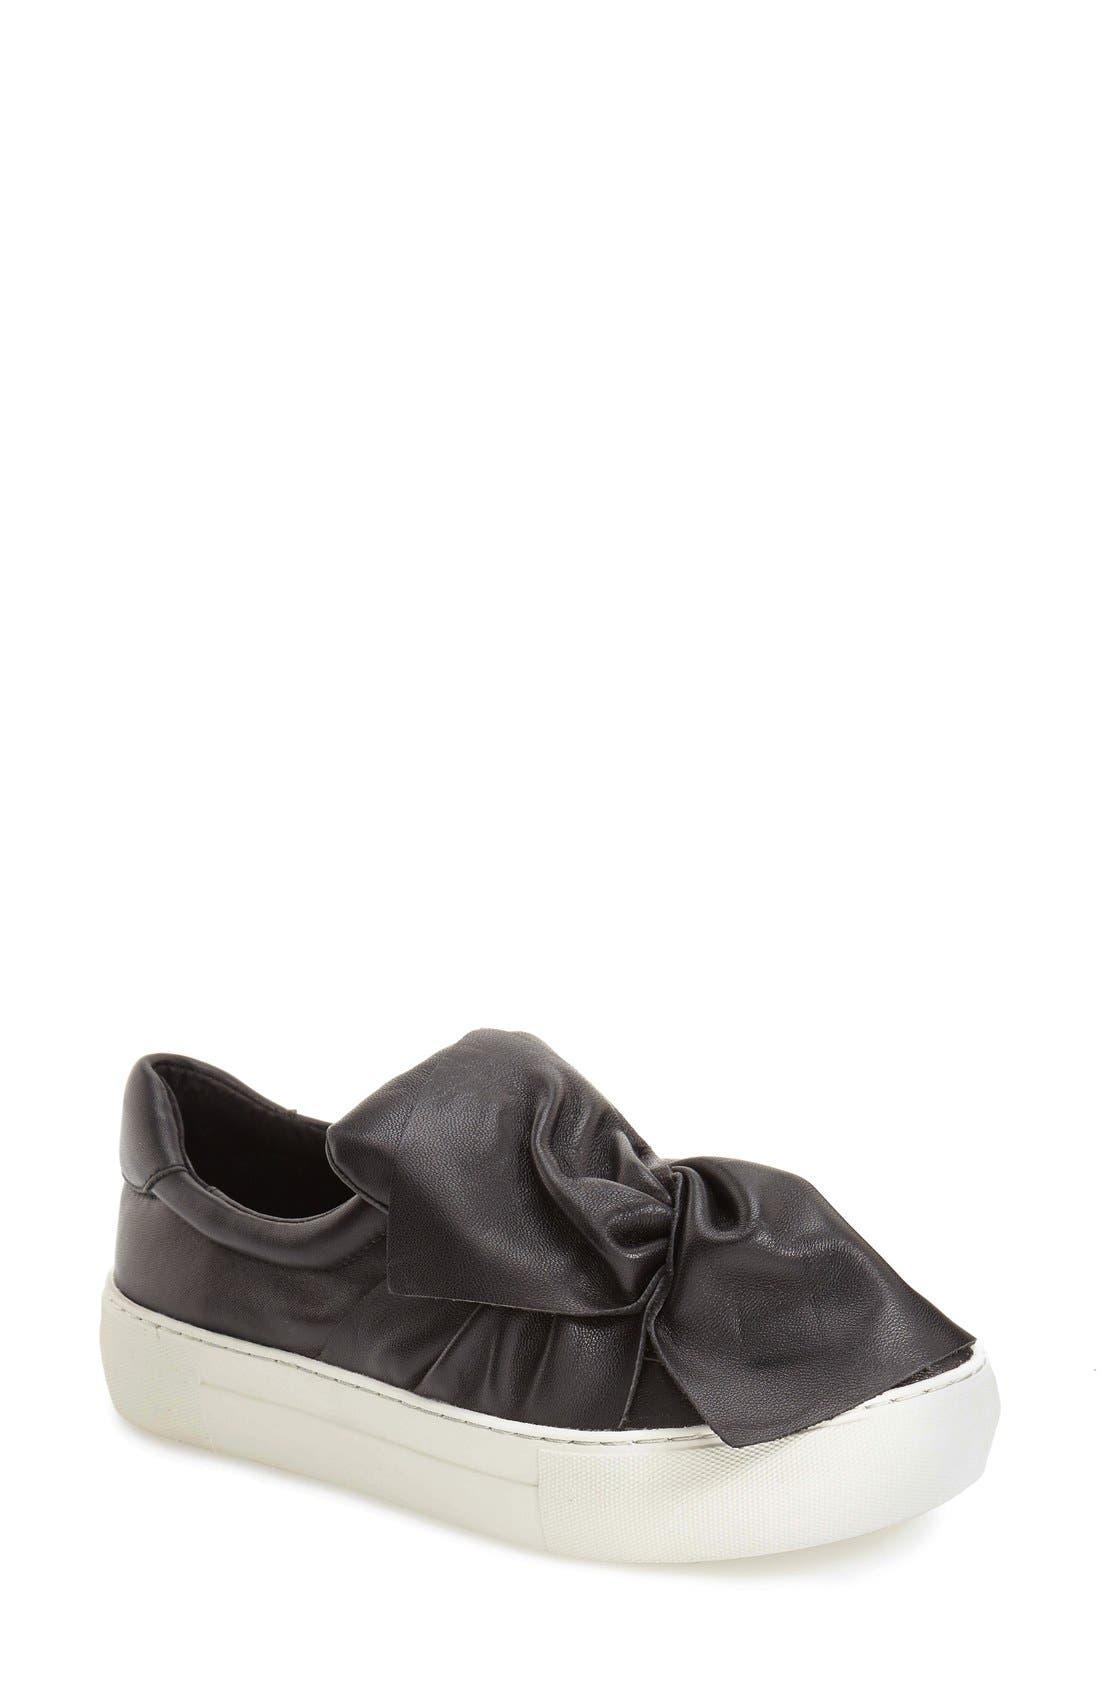 Alternate Image 1 Selected - JSlides 'Annabelle' Platform Sneaker (Women)